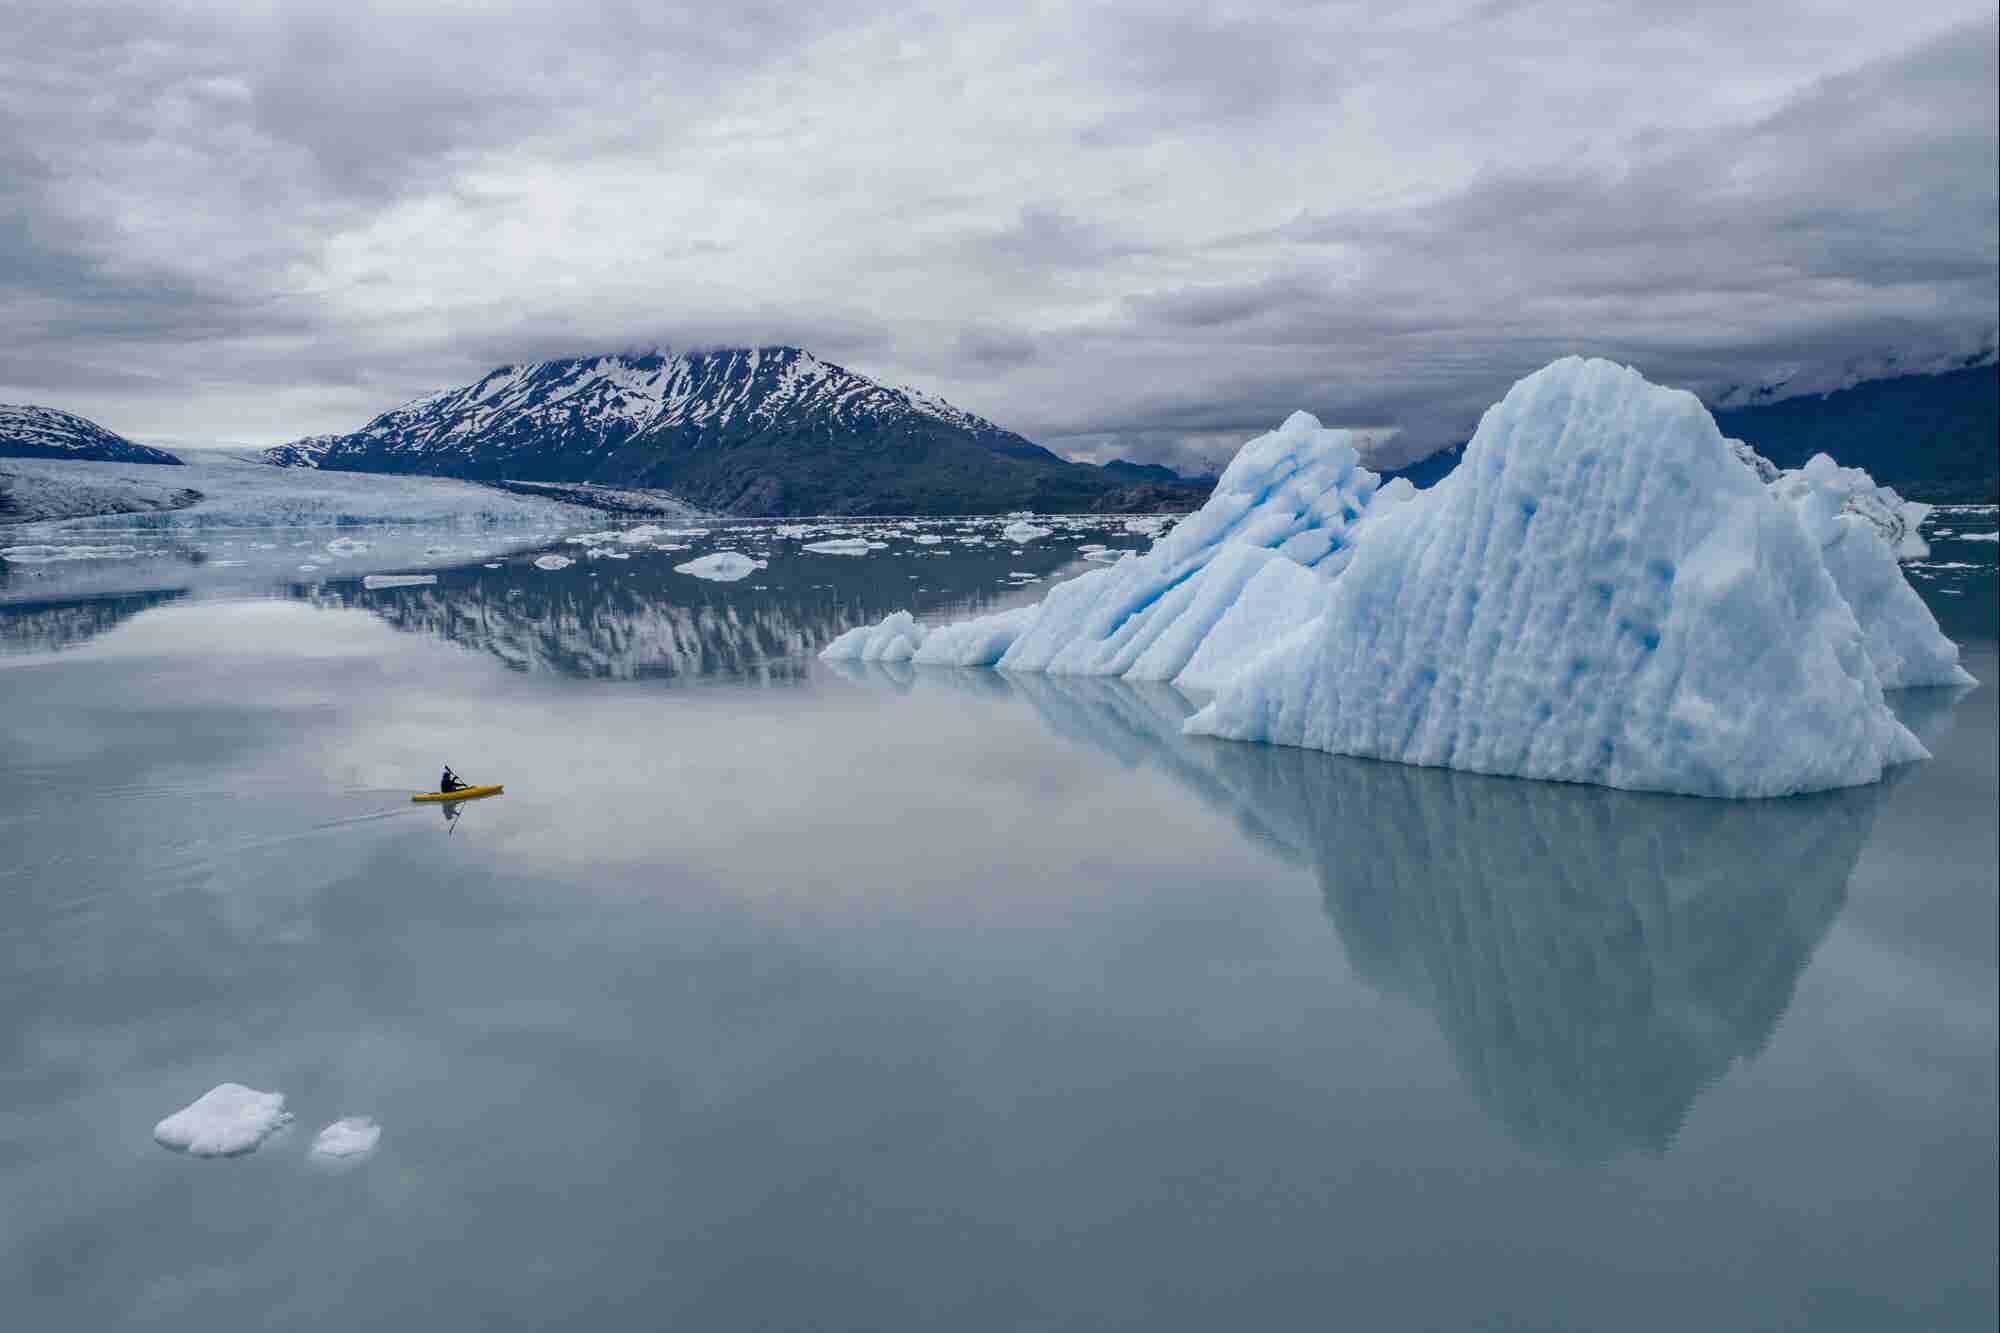 Alaska Is Offering Entrepreneurs a Huge Renewable Energy Opportunity